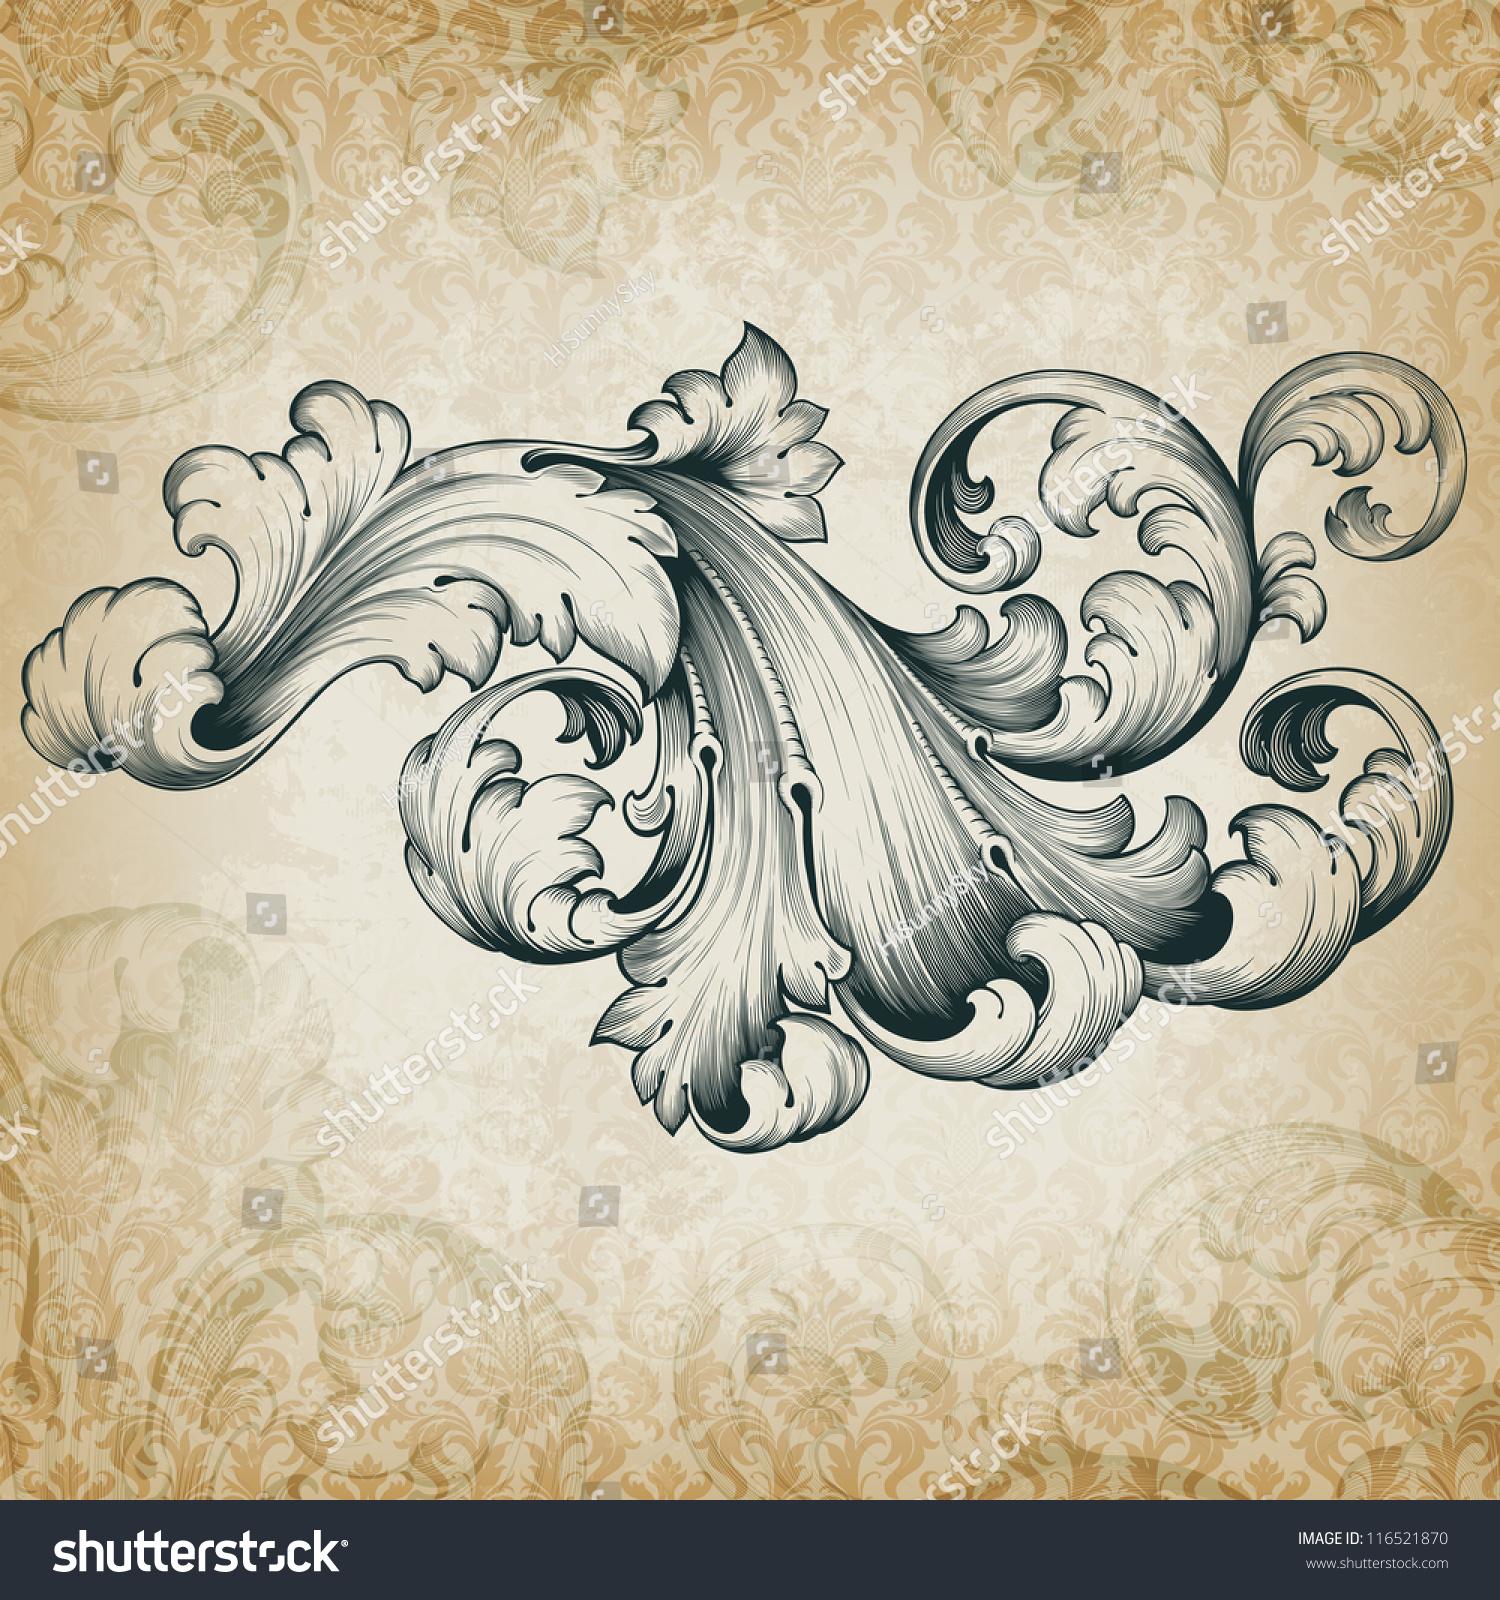 Antique Scroll Vector: Vector Vintage Baroque Engraving Floral Scroll Filigree